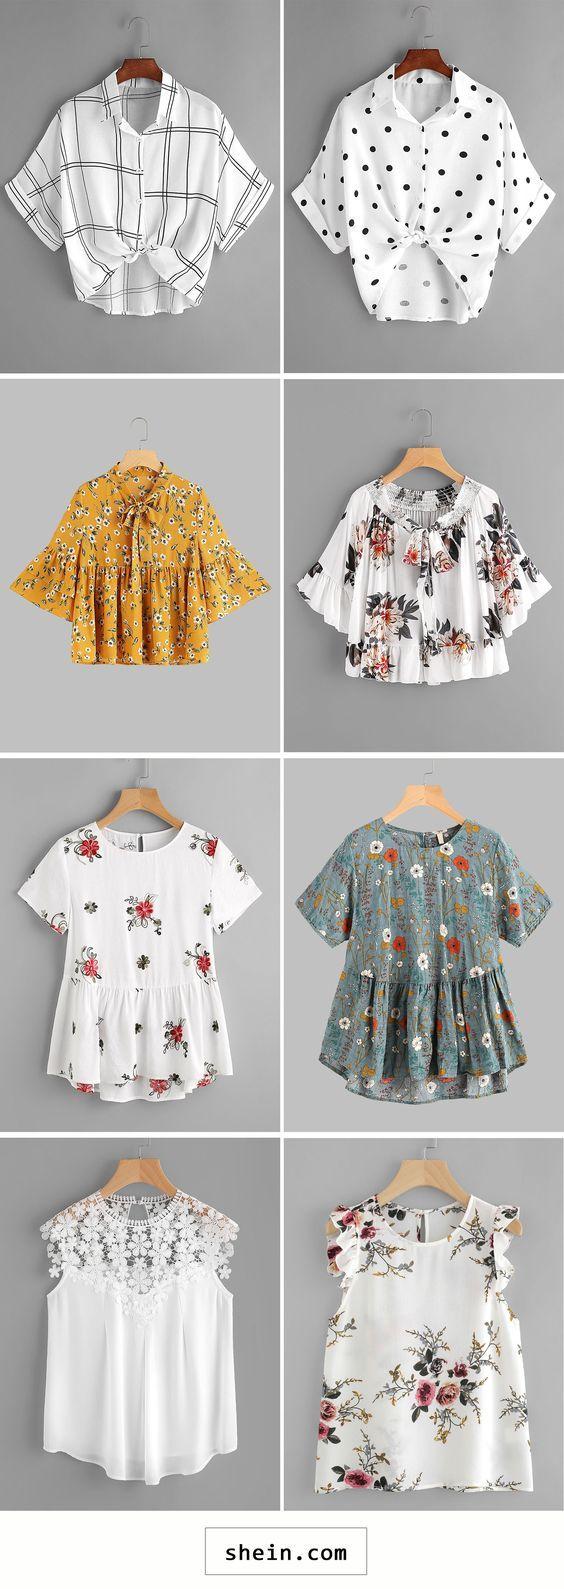 7 mejores imágenes de Women\'s Clothing en Pinterest